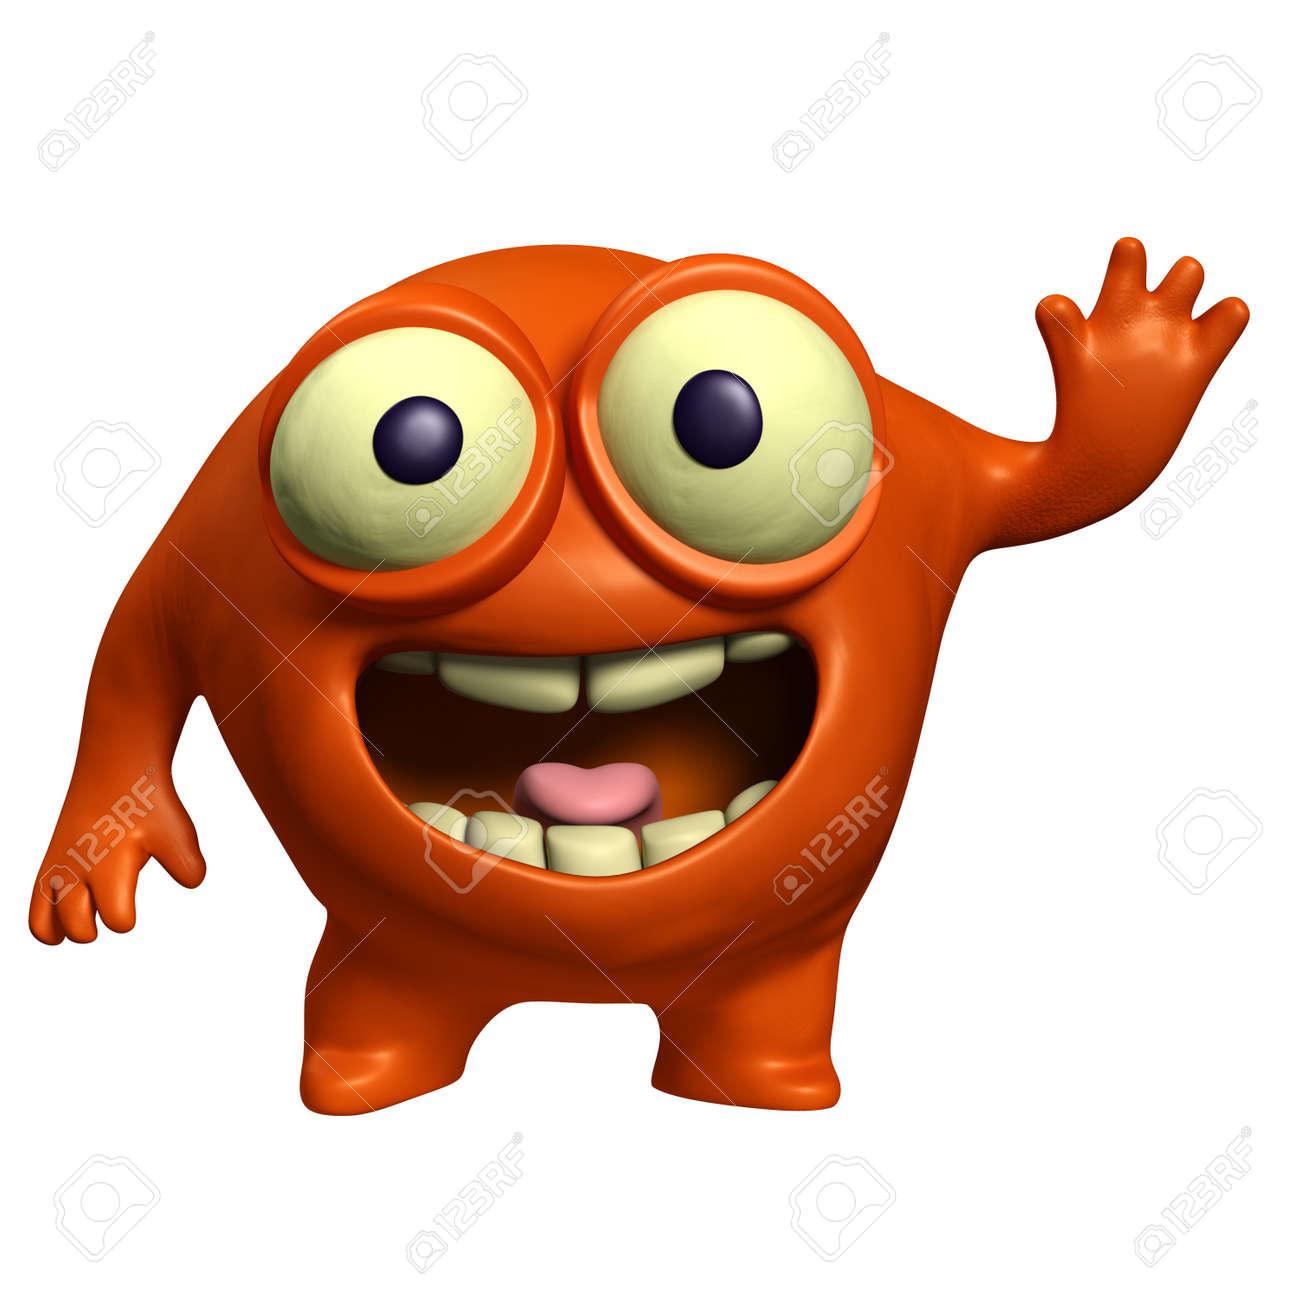 3d cartoon red alien Stock Photo - 15625036